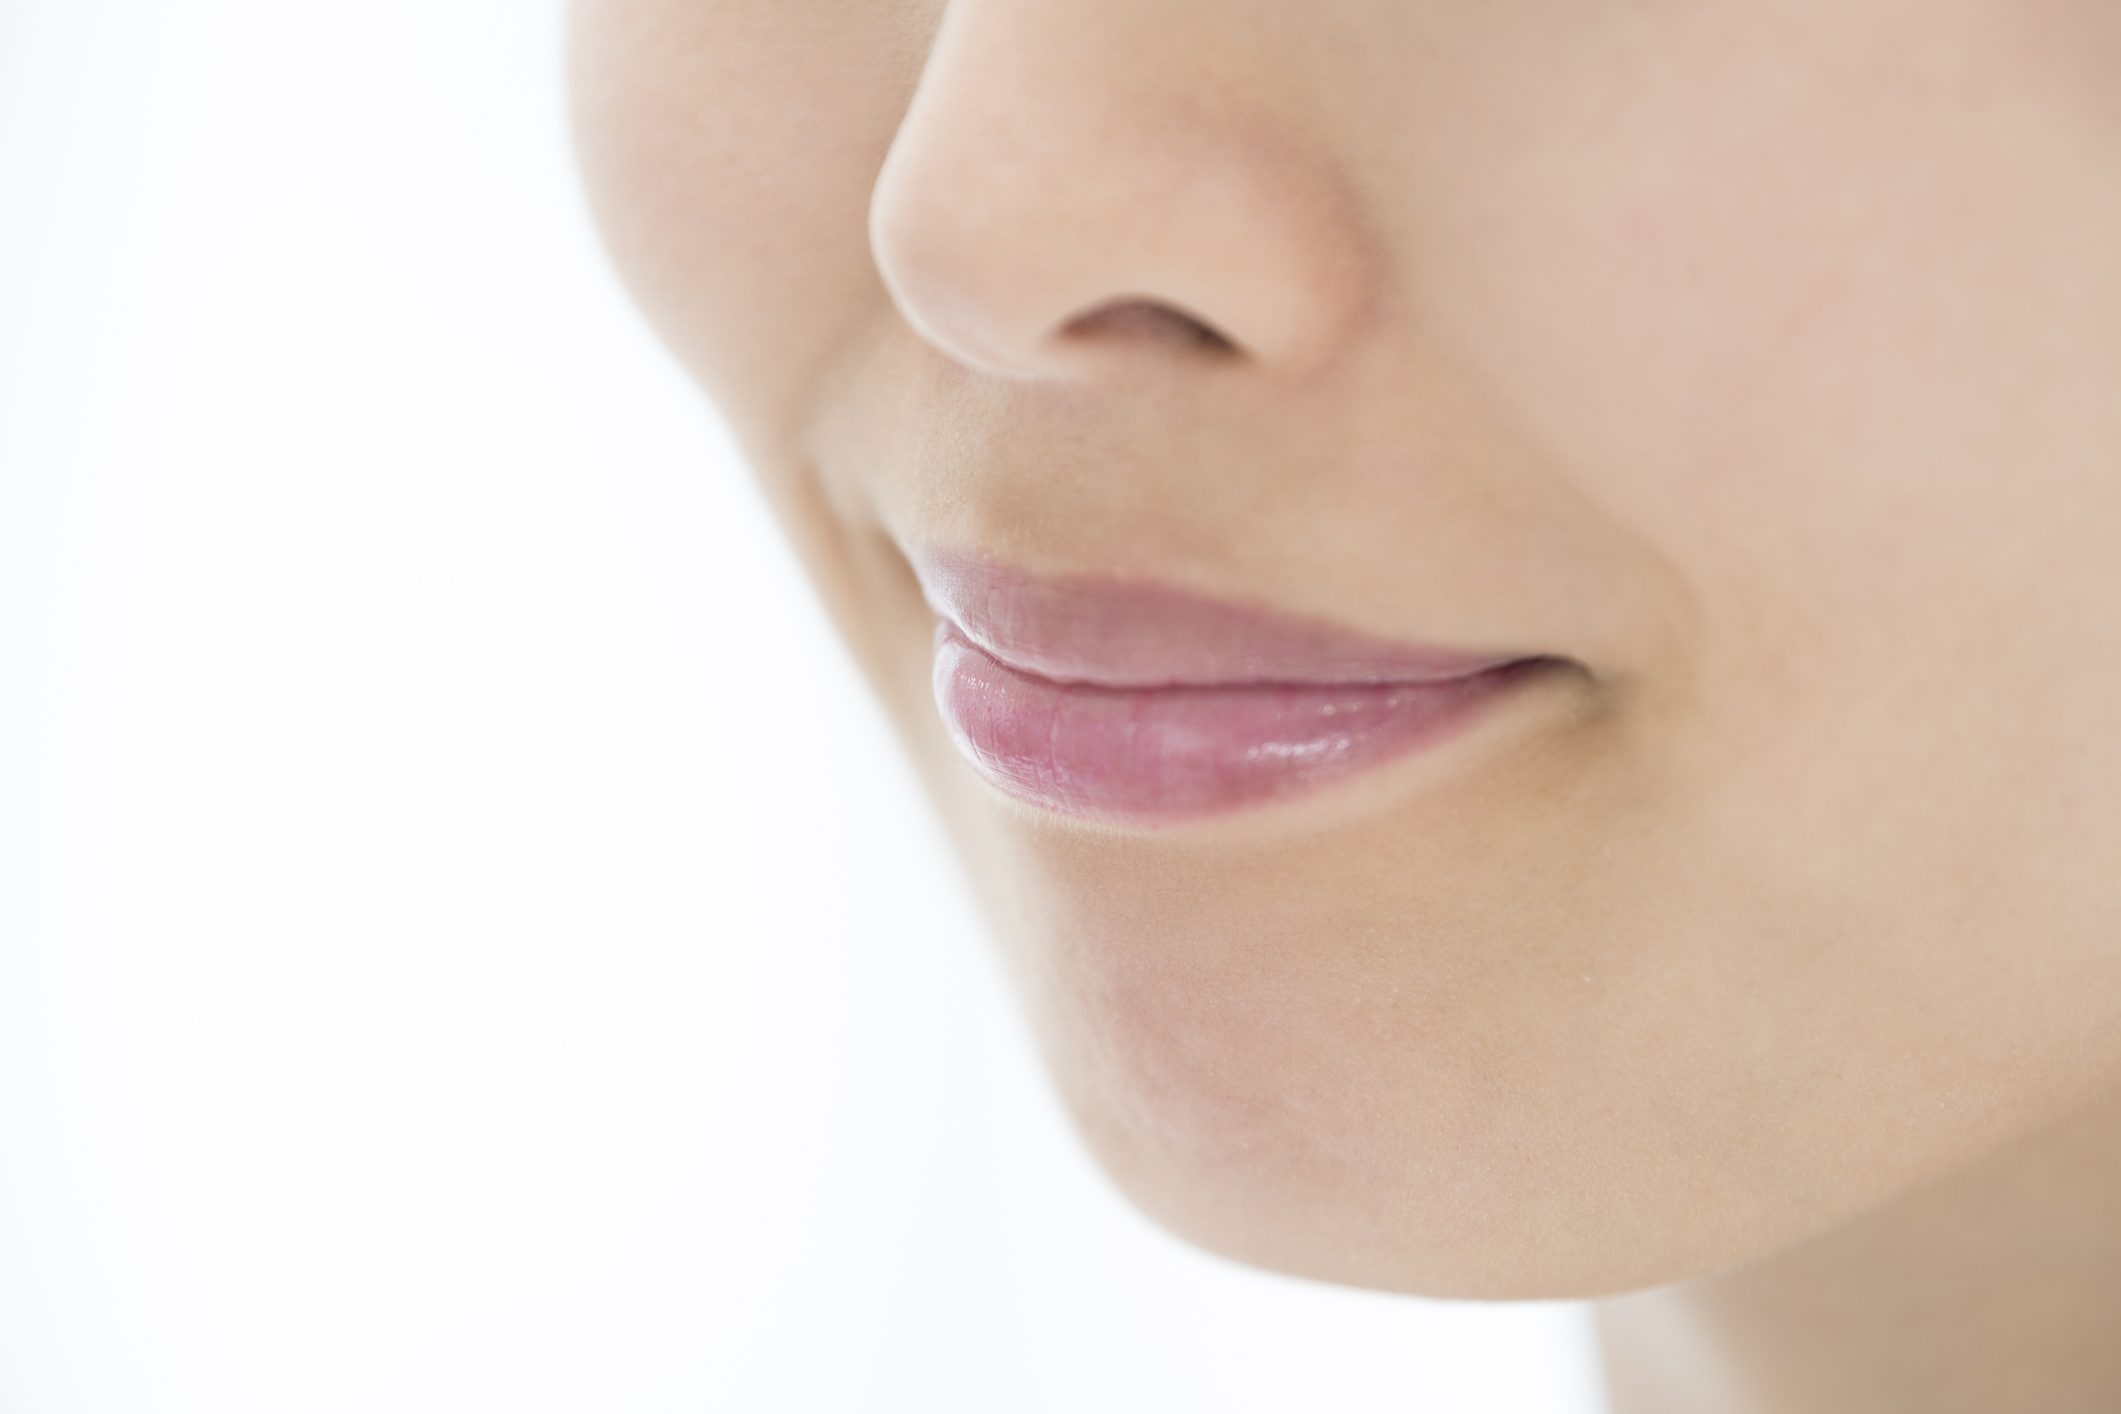 patient after a Laser Facial Treatment